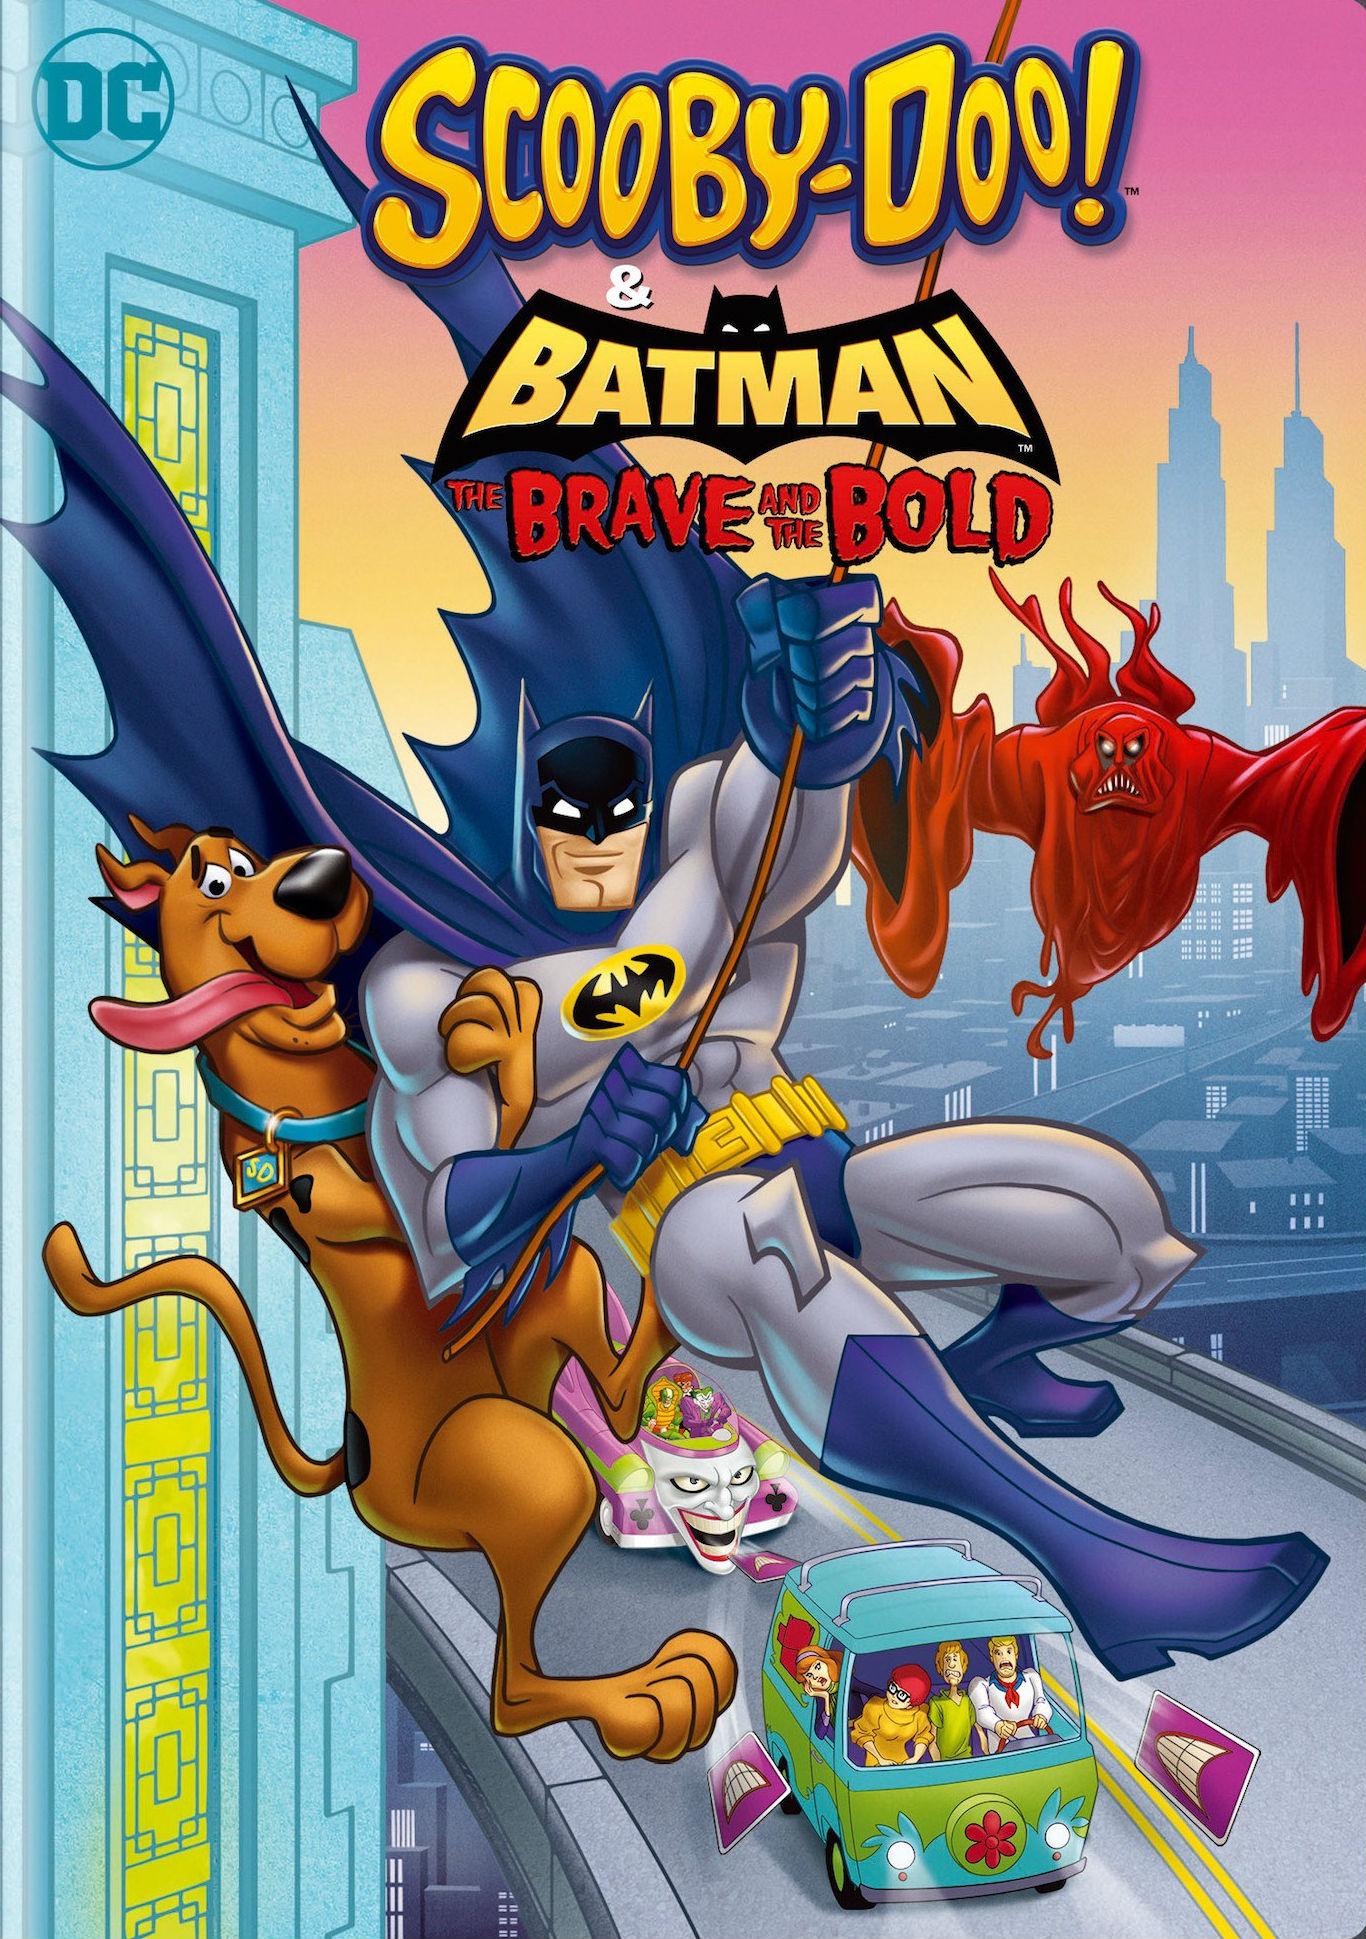 batman and harley quinn subtitles download